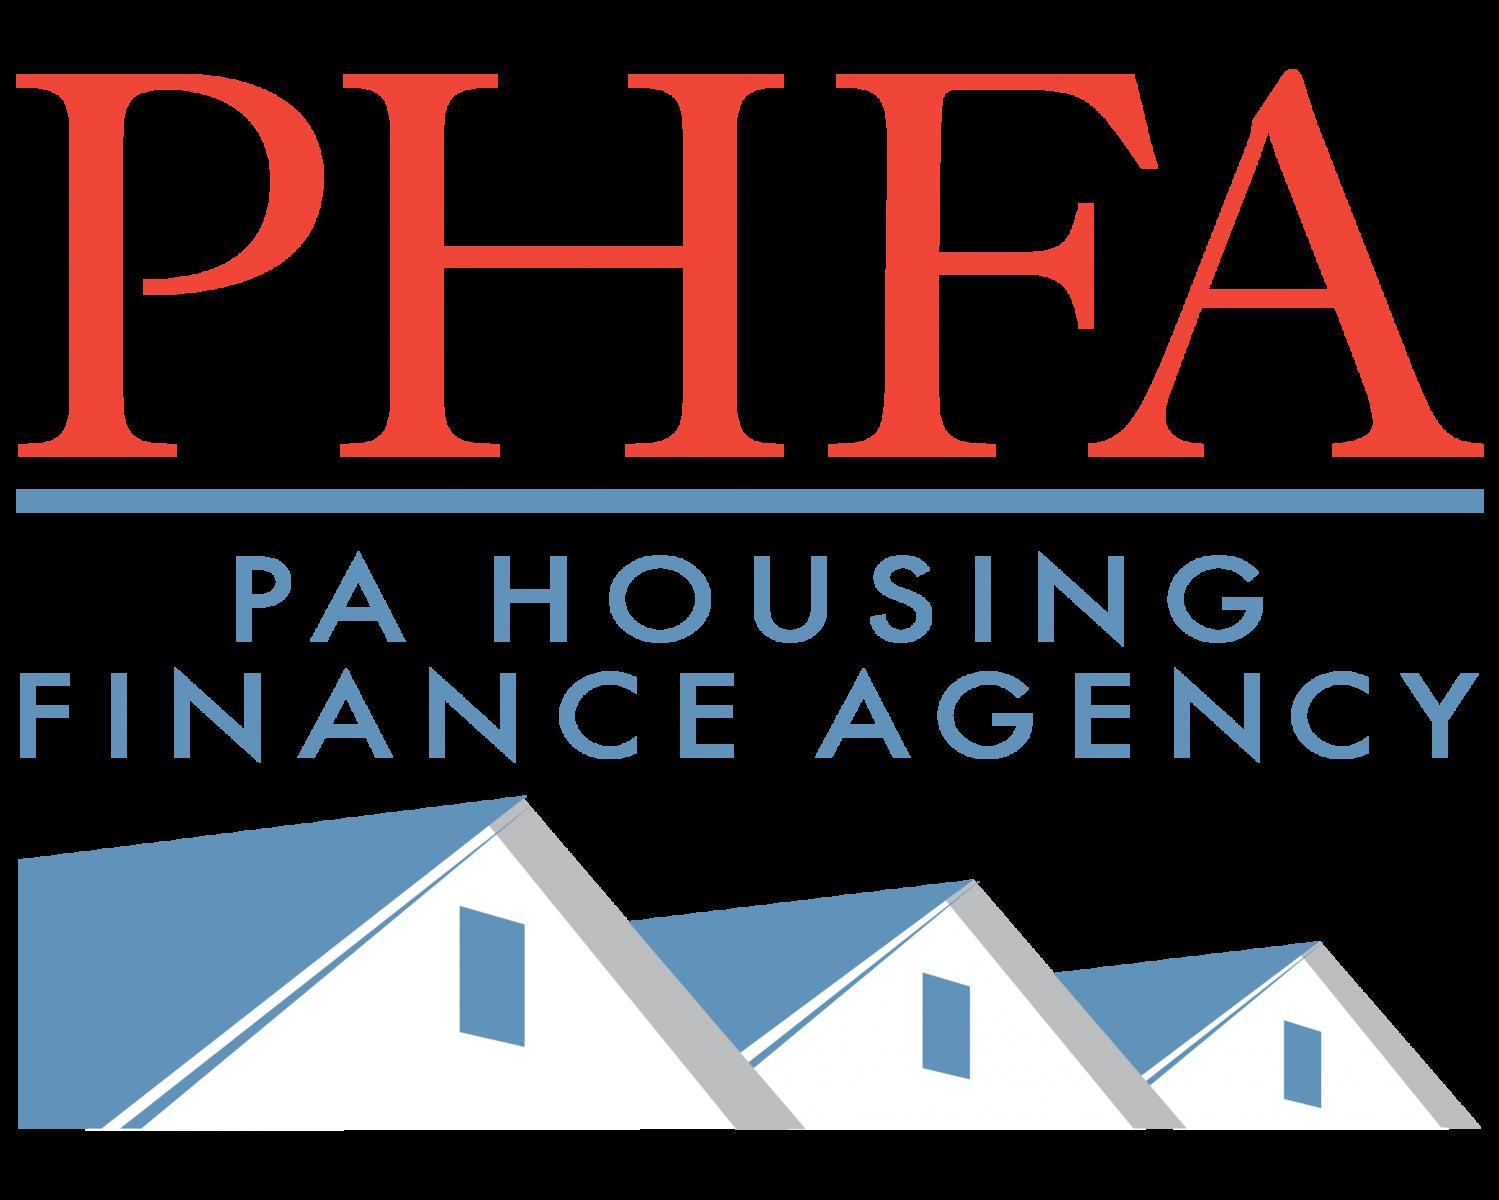 PA Housing Finance Agency logo